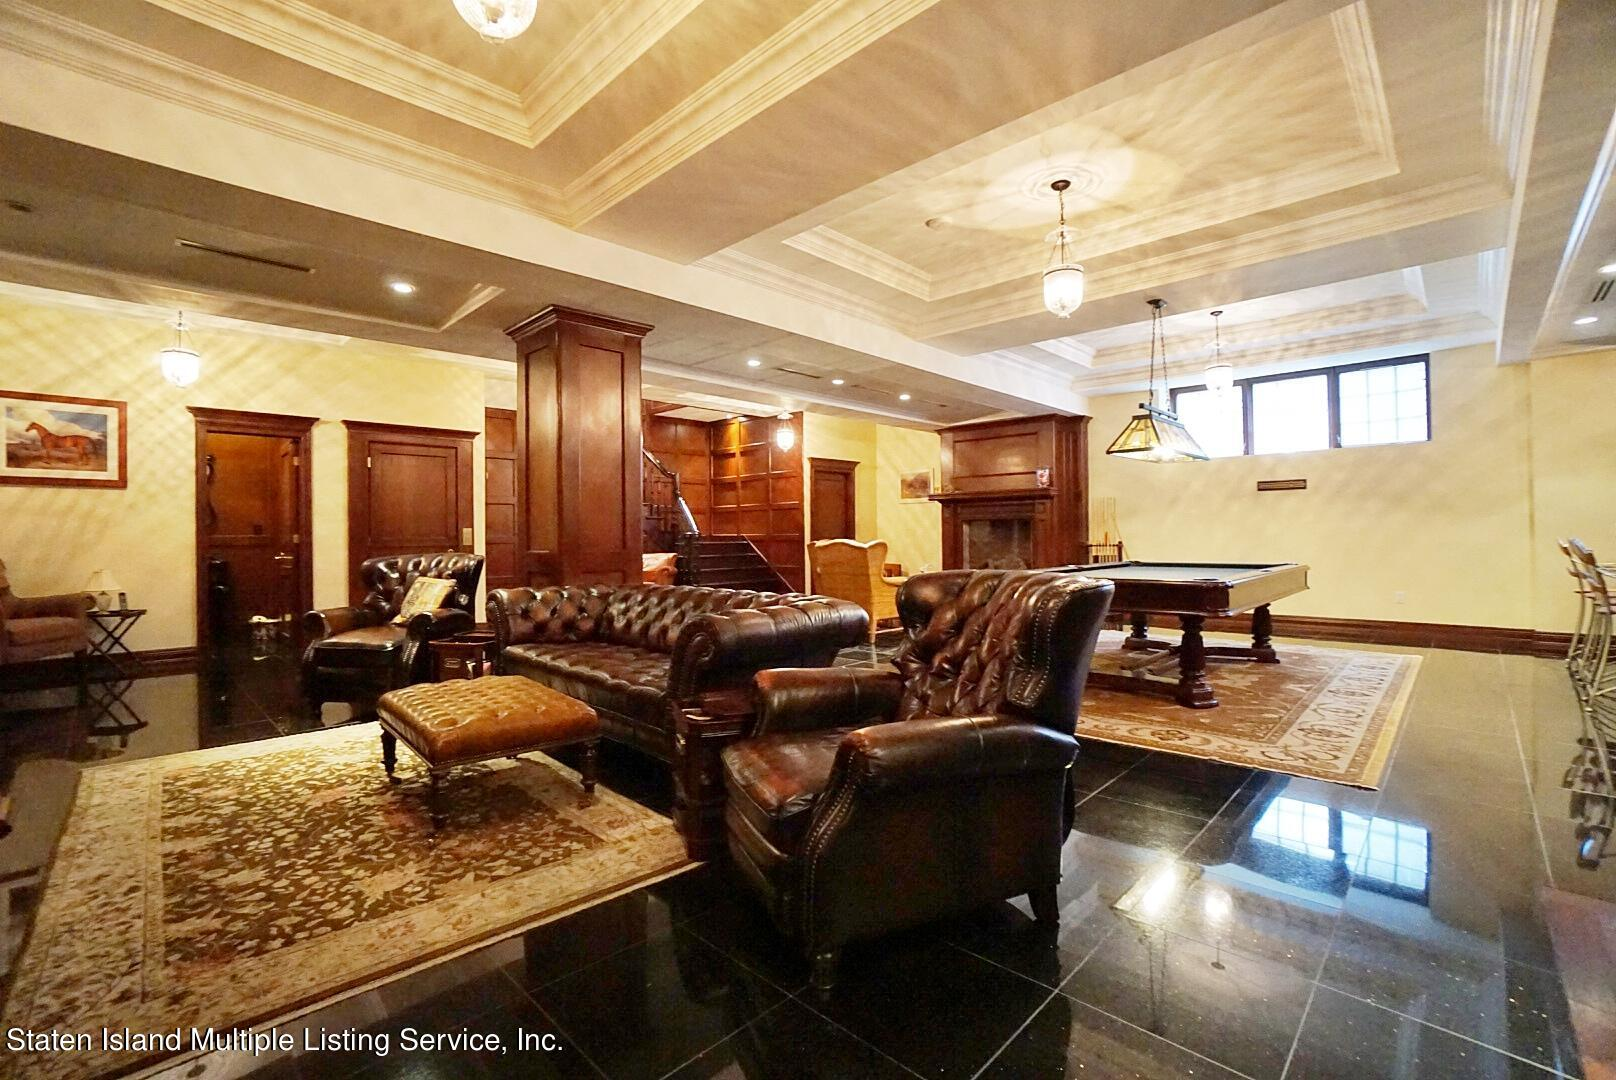 Single Family - Detached 129 Coverly Avenue   Staten Island, NY 10301, MLS-1144490-59